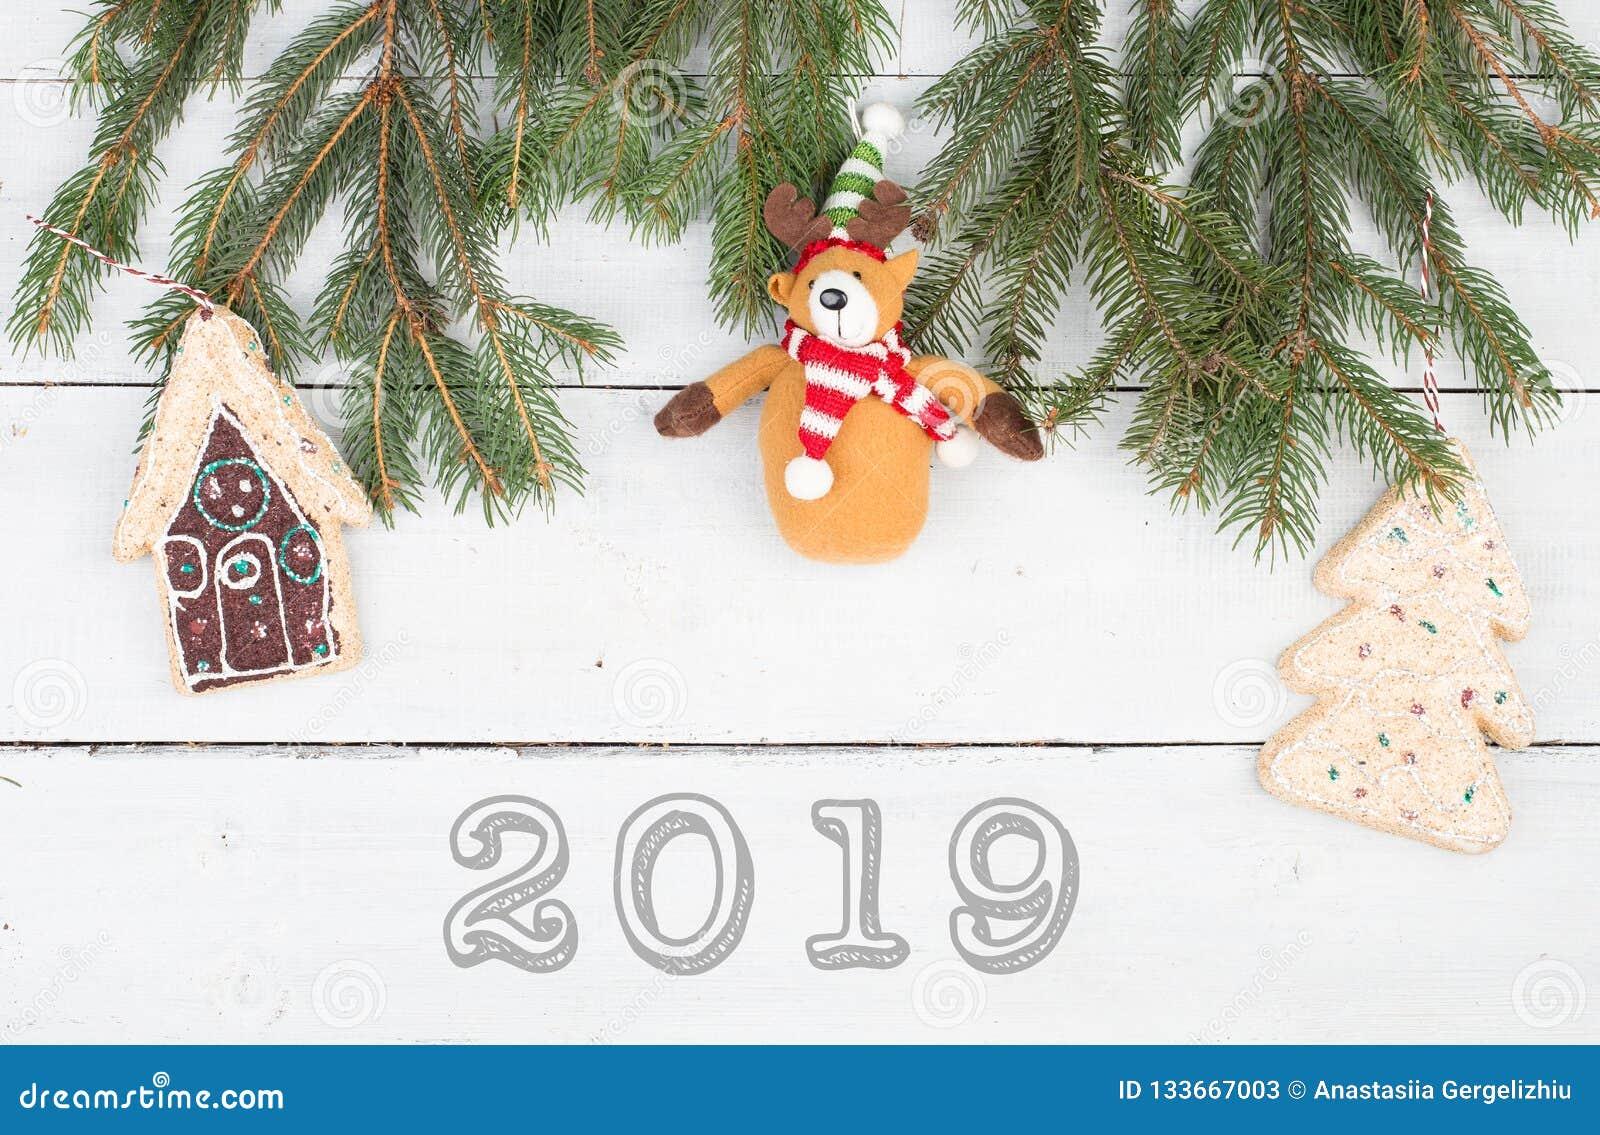 Christmas Tree White House 2019 Christmas Fir Branches, Gingerbread House, Christmas Tree, Teddy